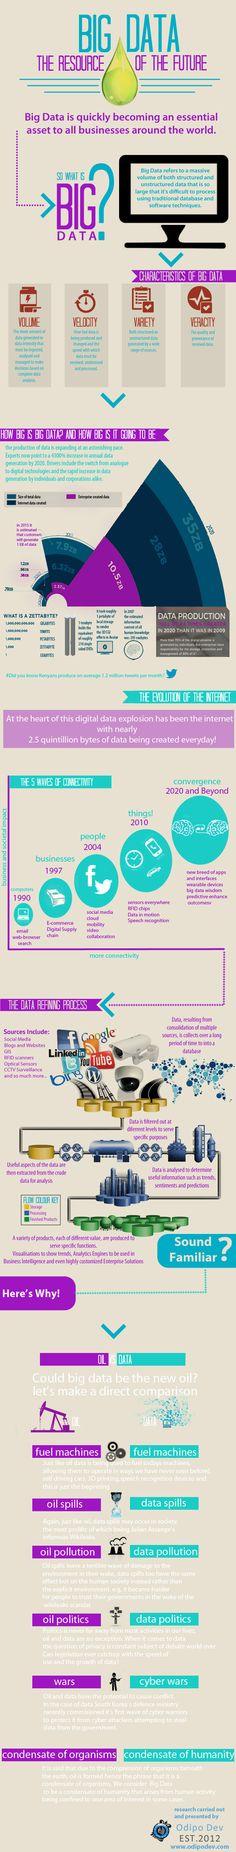 Big Data the resource of the future #infografia #infographic #internet